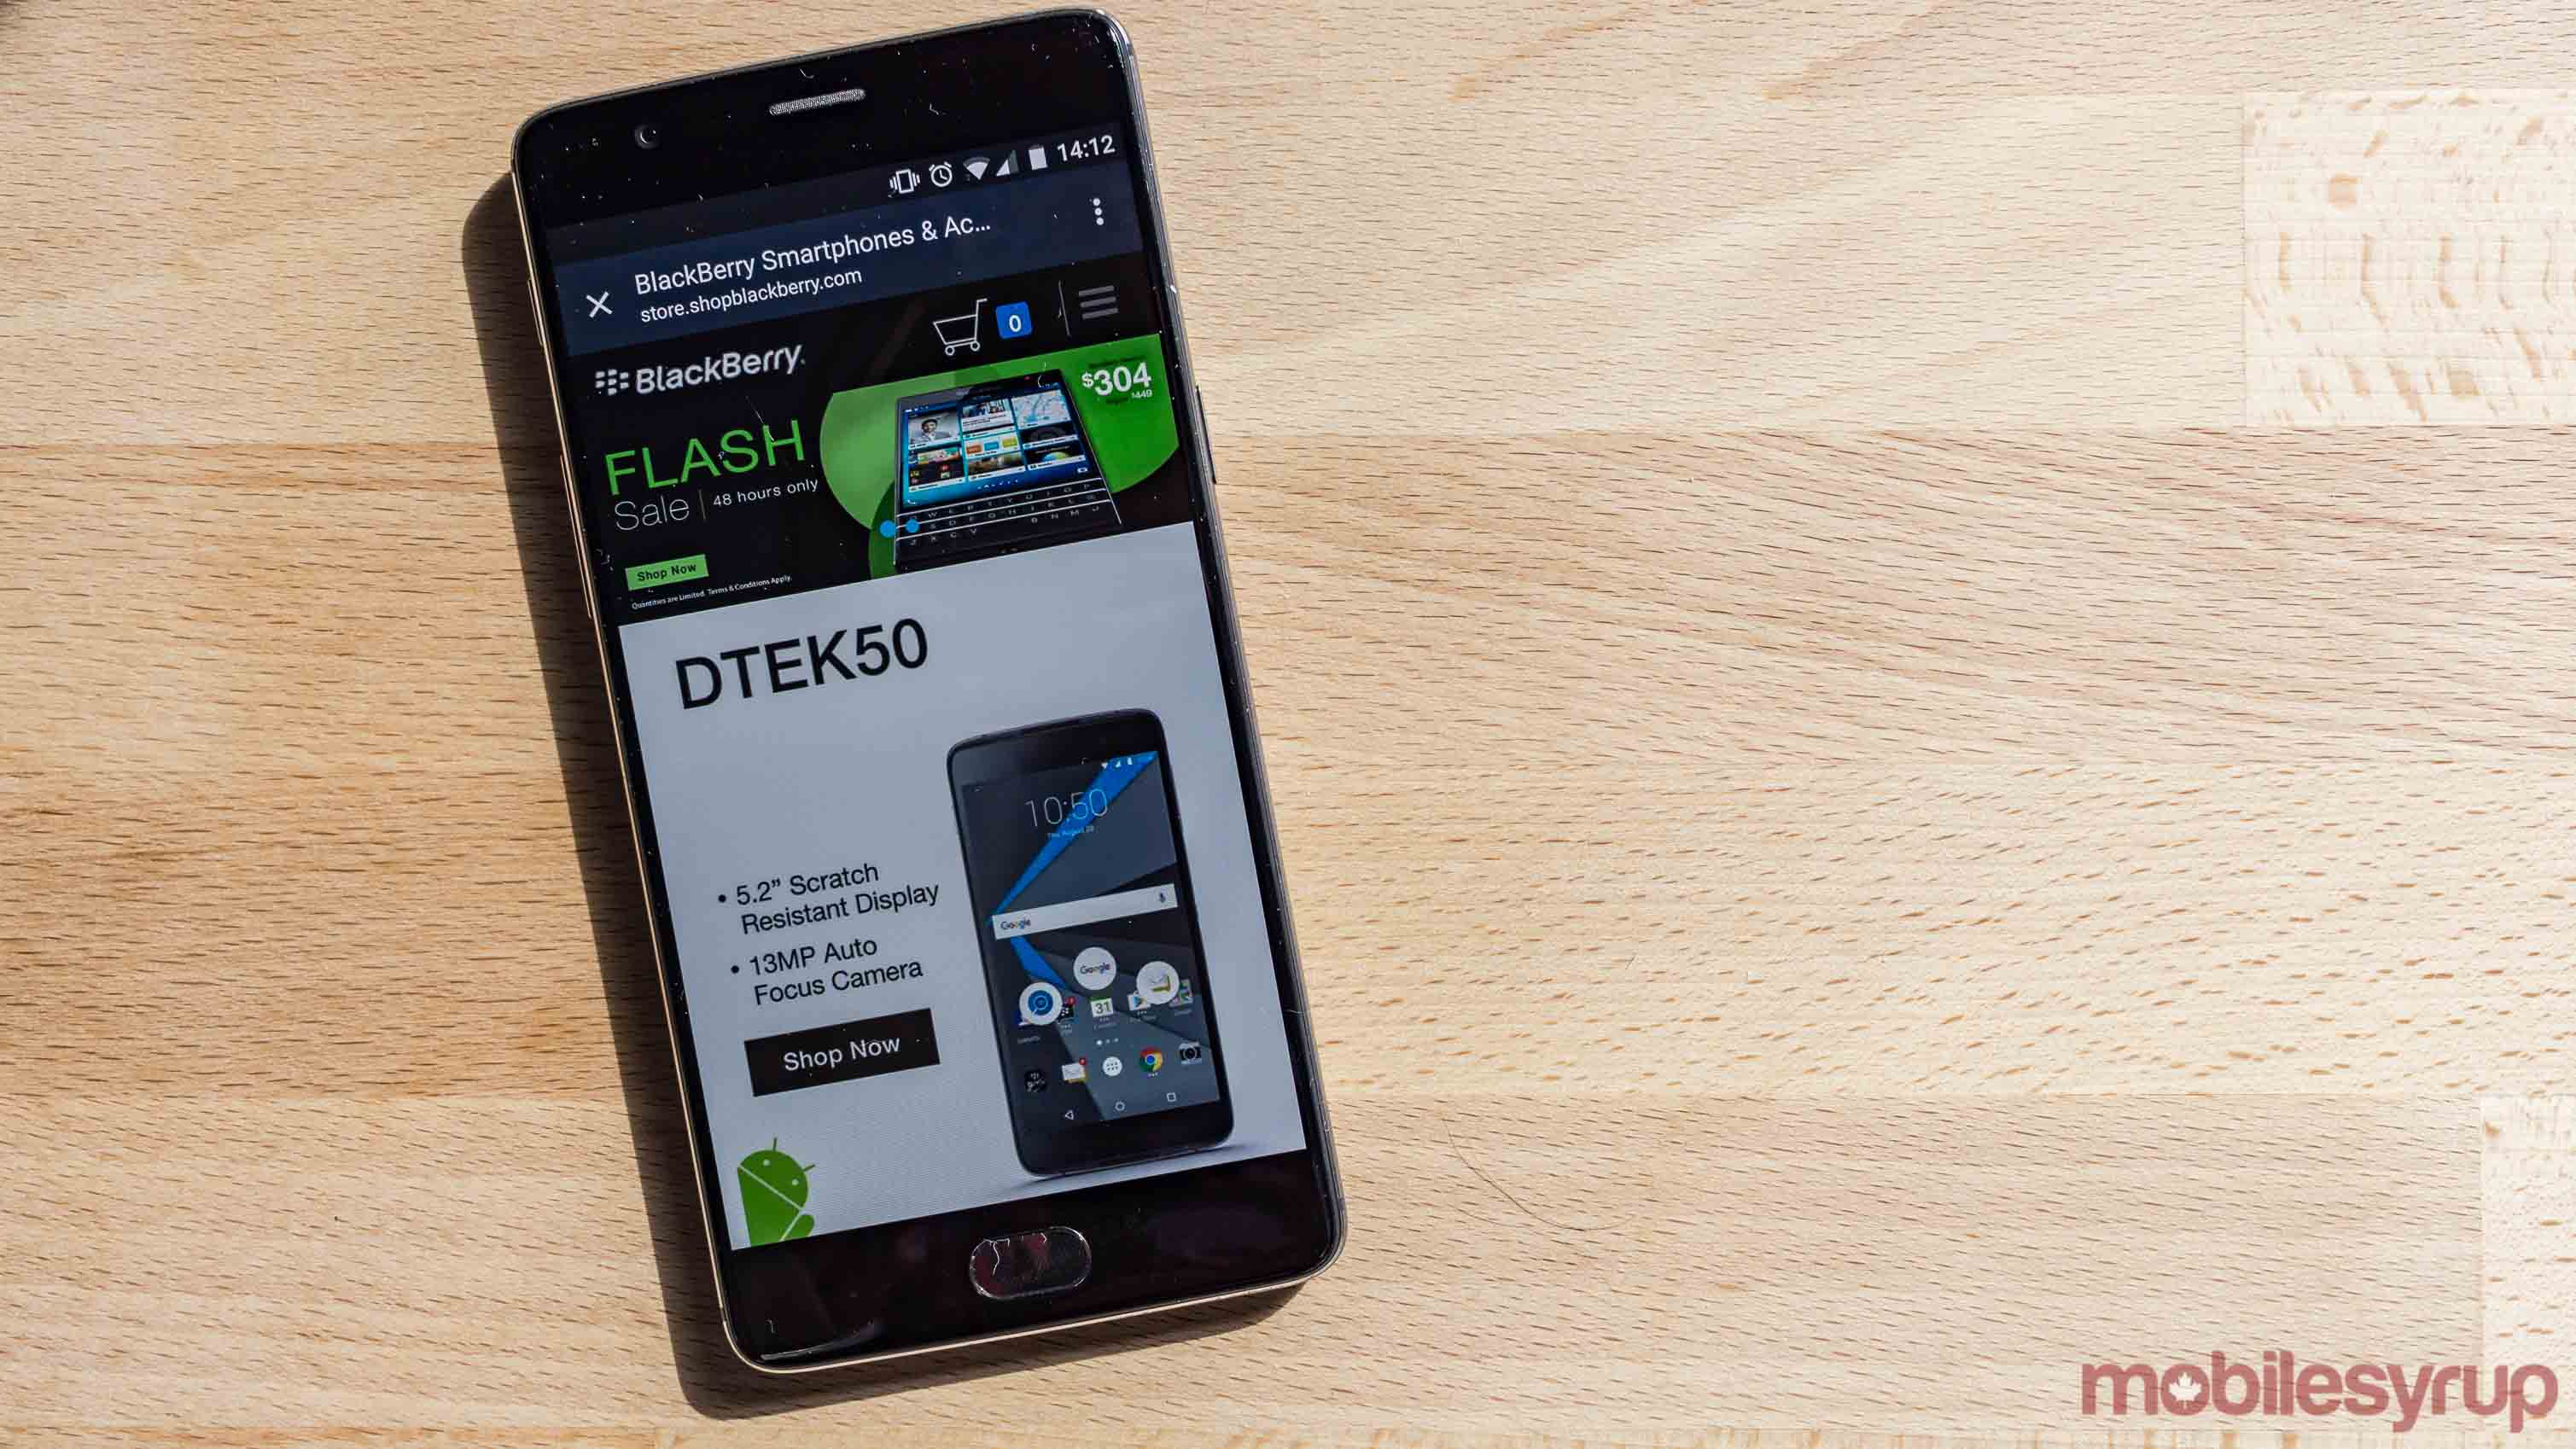 Shop BlackBerry mobile website - BlackBerry discounts DTEK 60 DTEK 50